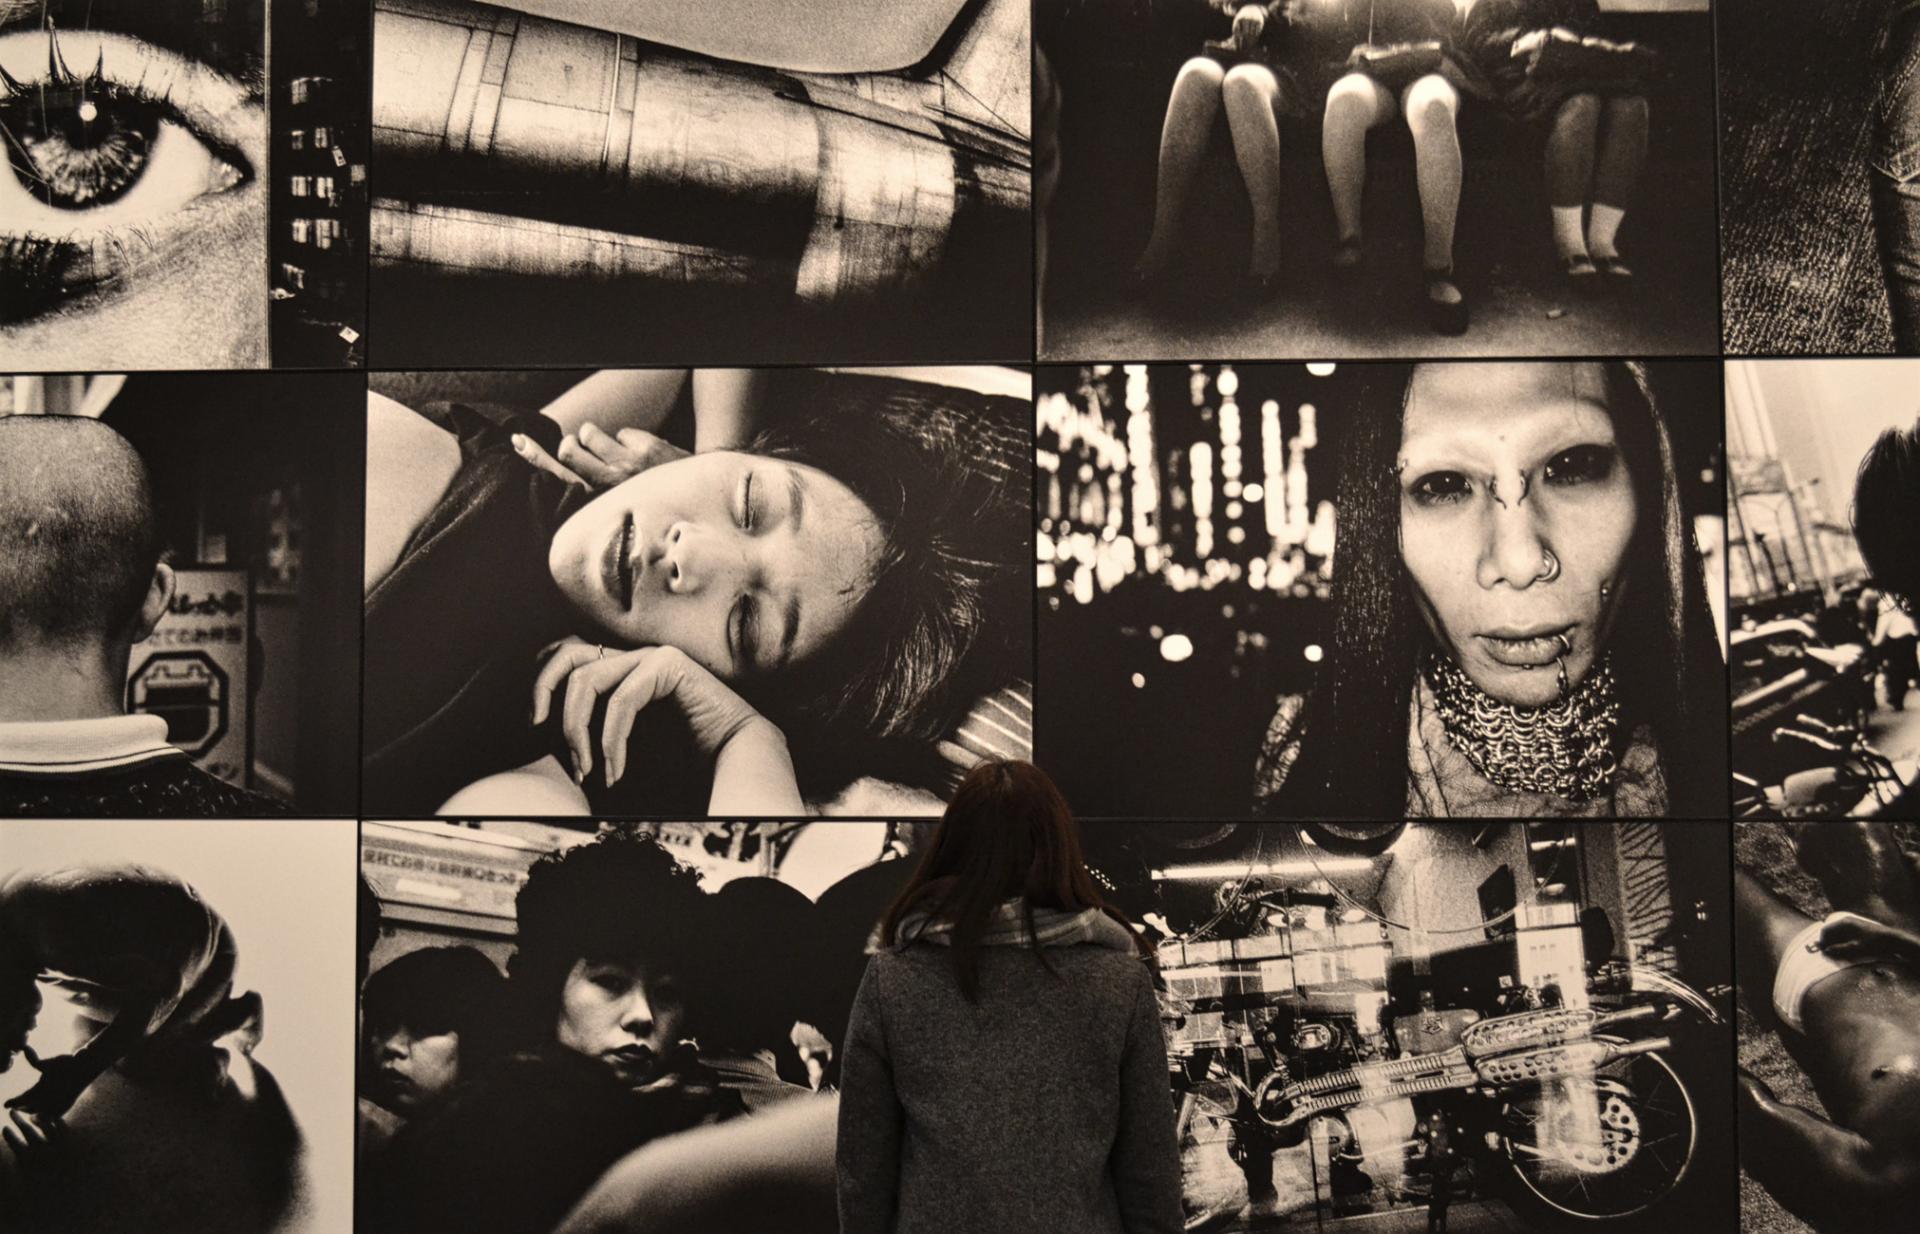 Museo Tate Modern de Londres